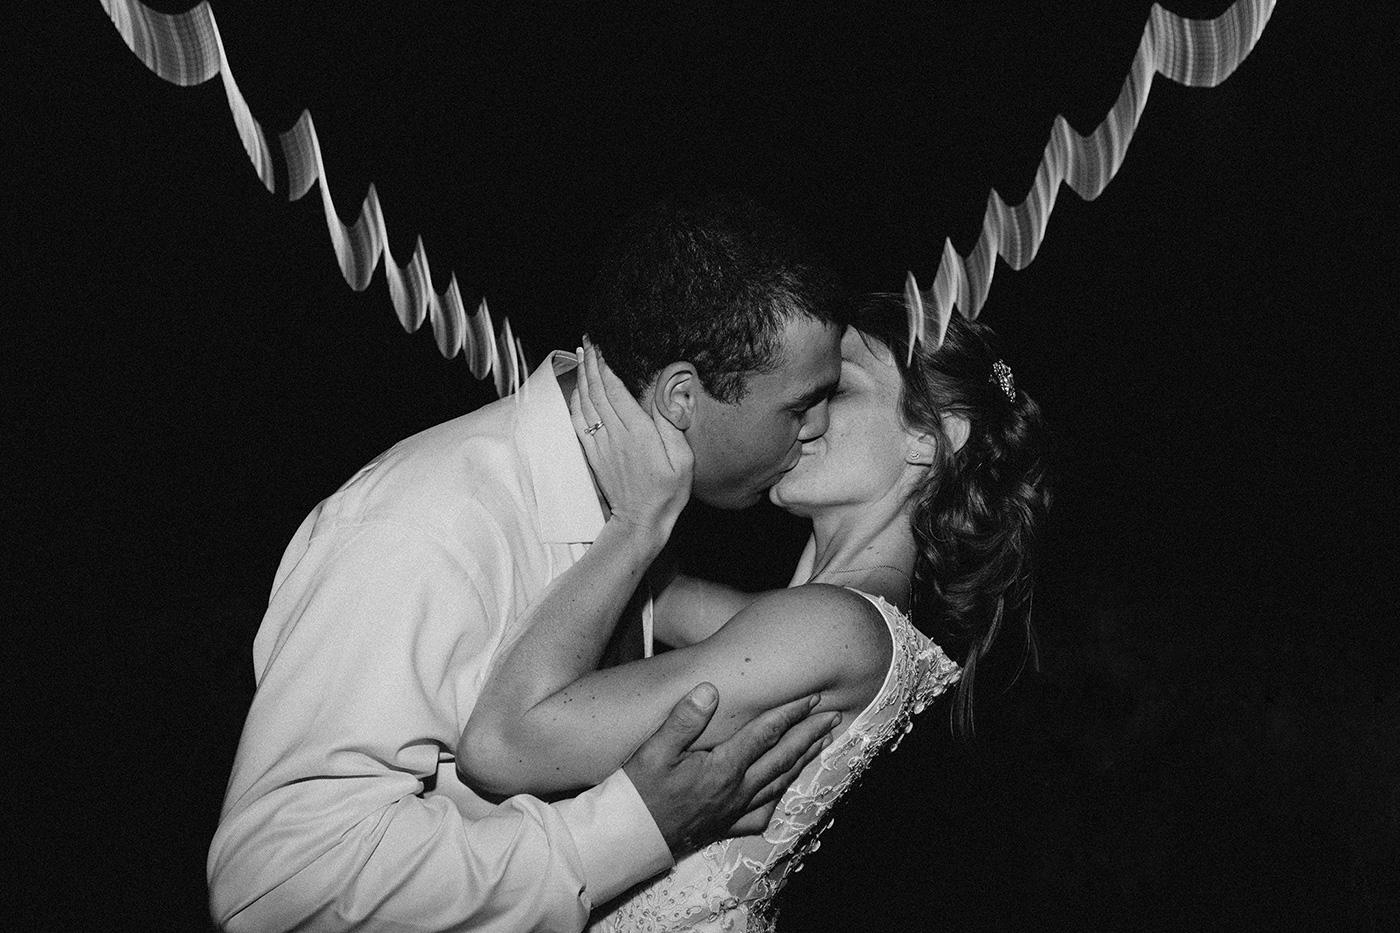 vermont-wedding-photographer-outdoor-farm-wedding-kiss.jpg